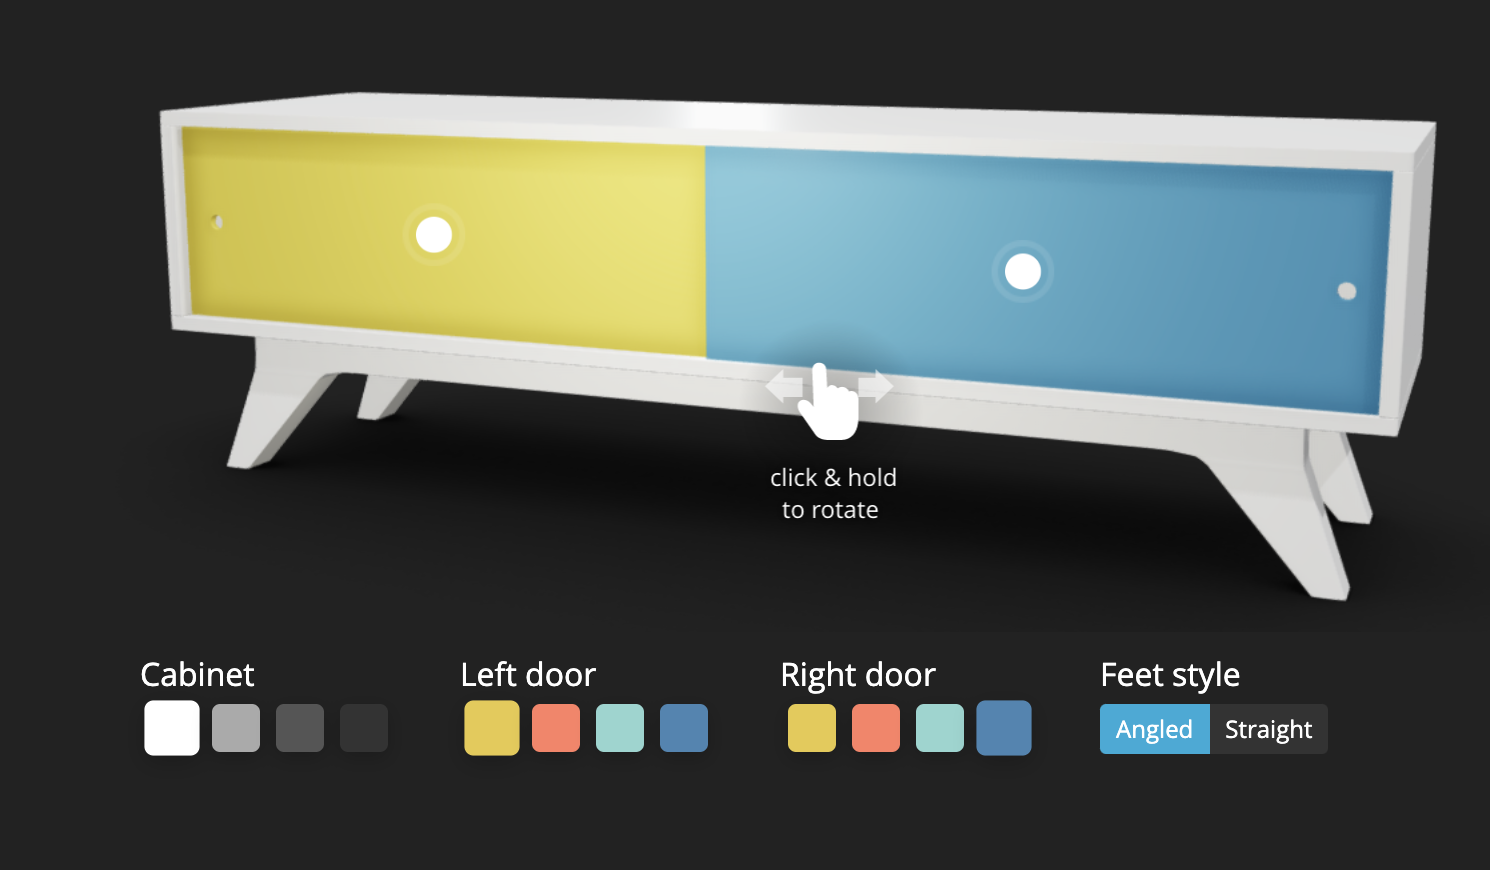 Sketchfab 3D furniture configurator